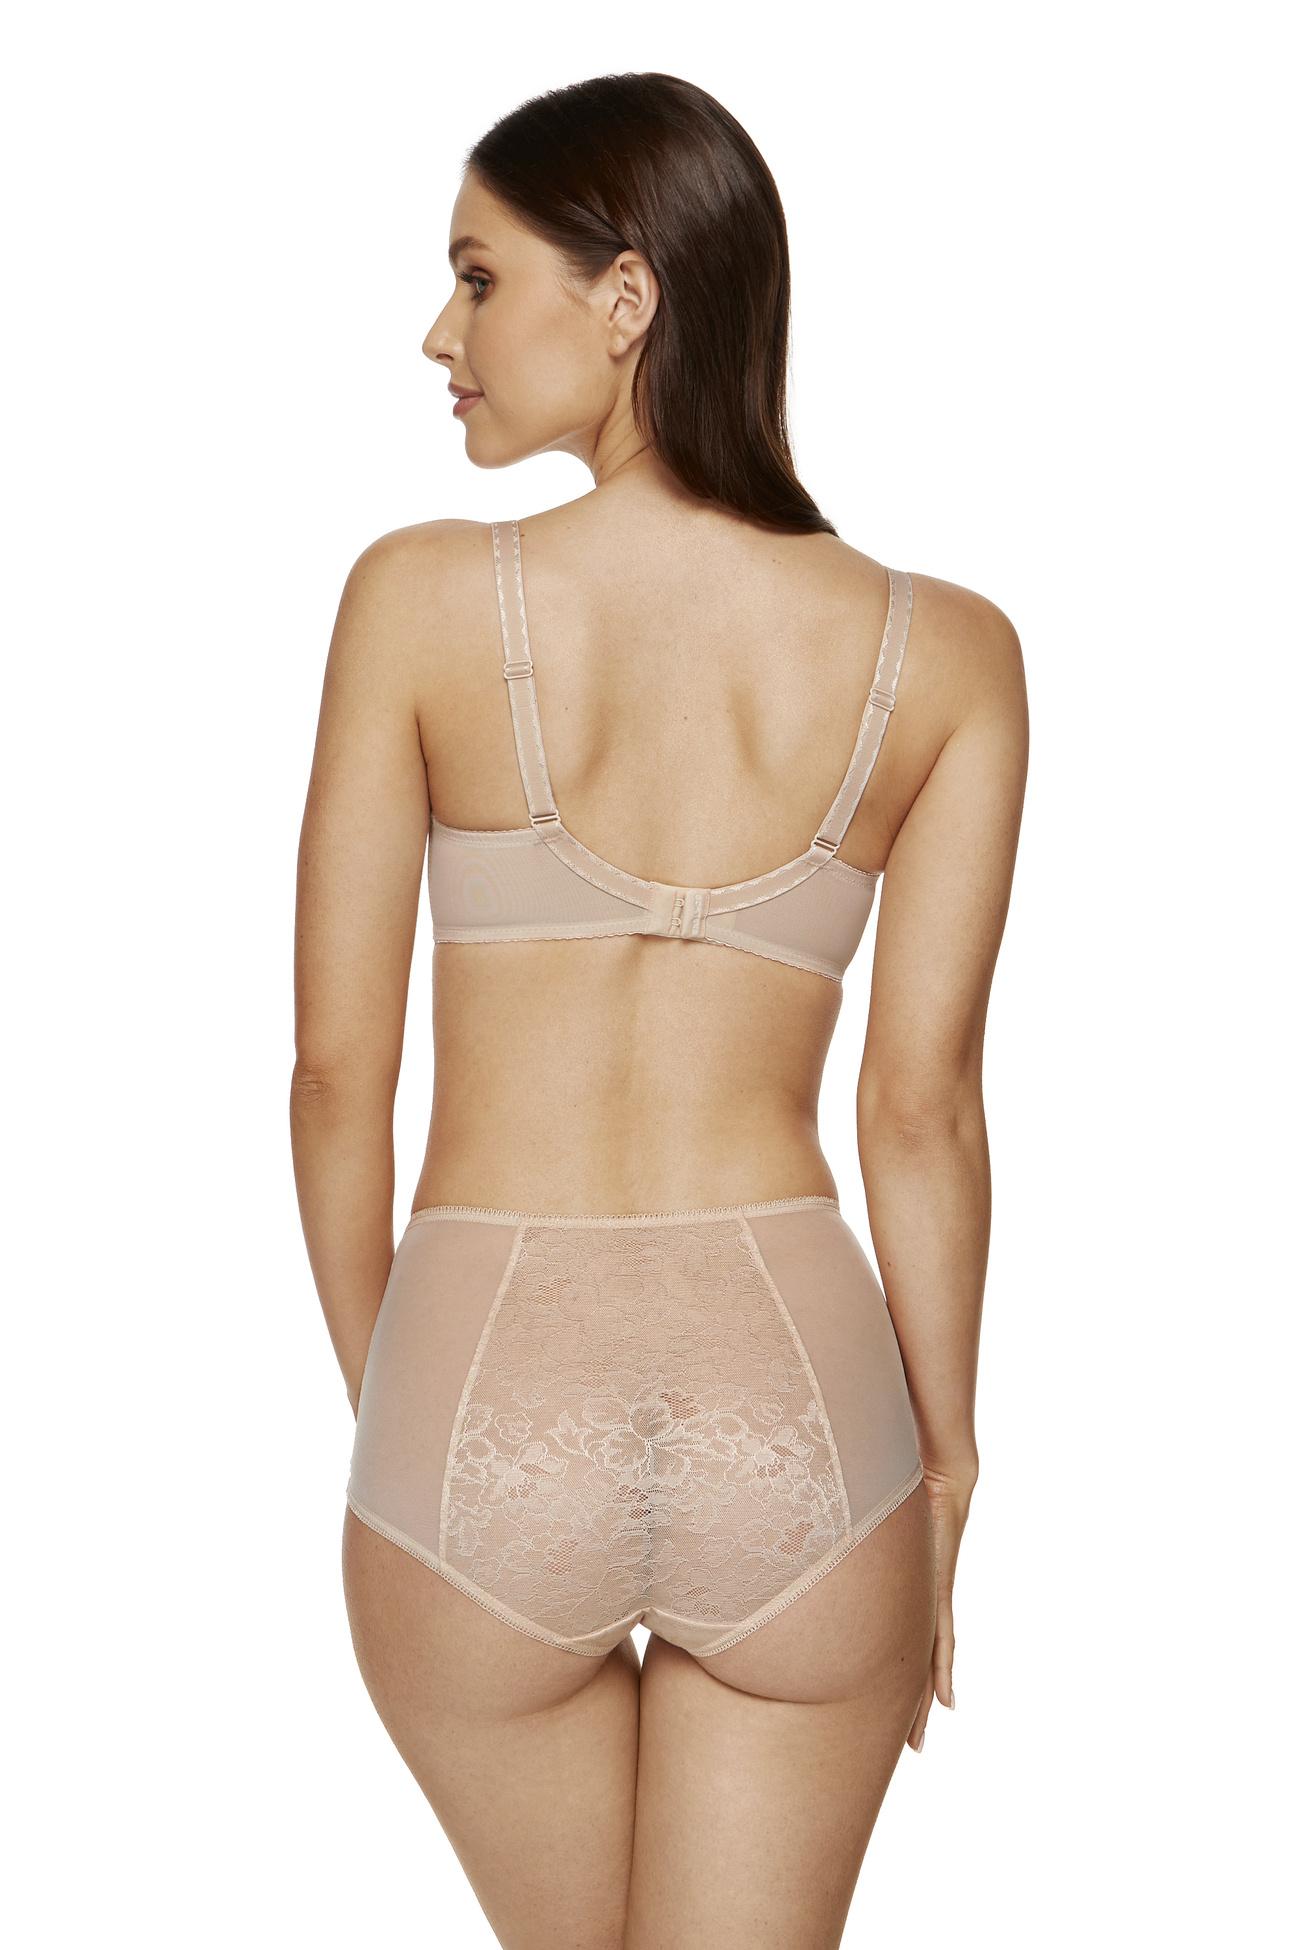 Gorteks Elise FW high waist panty beige Classic collection ed0bfa1fe